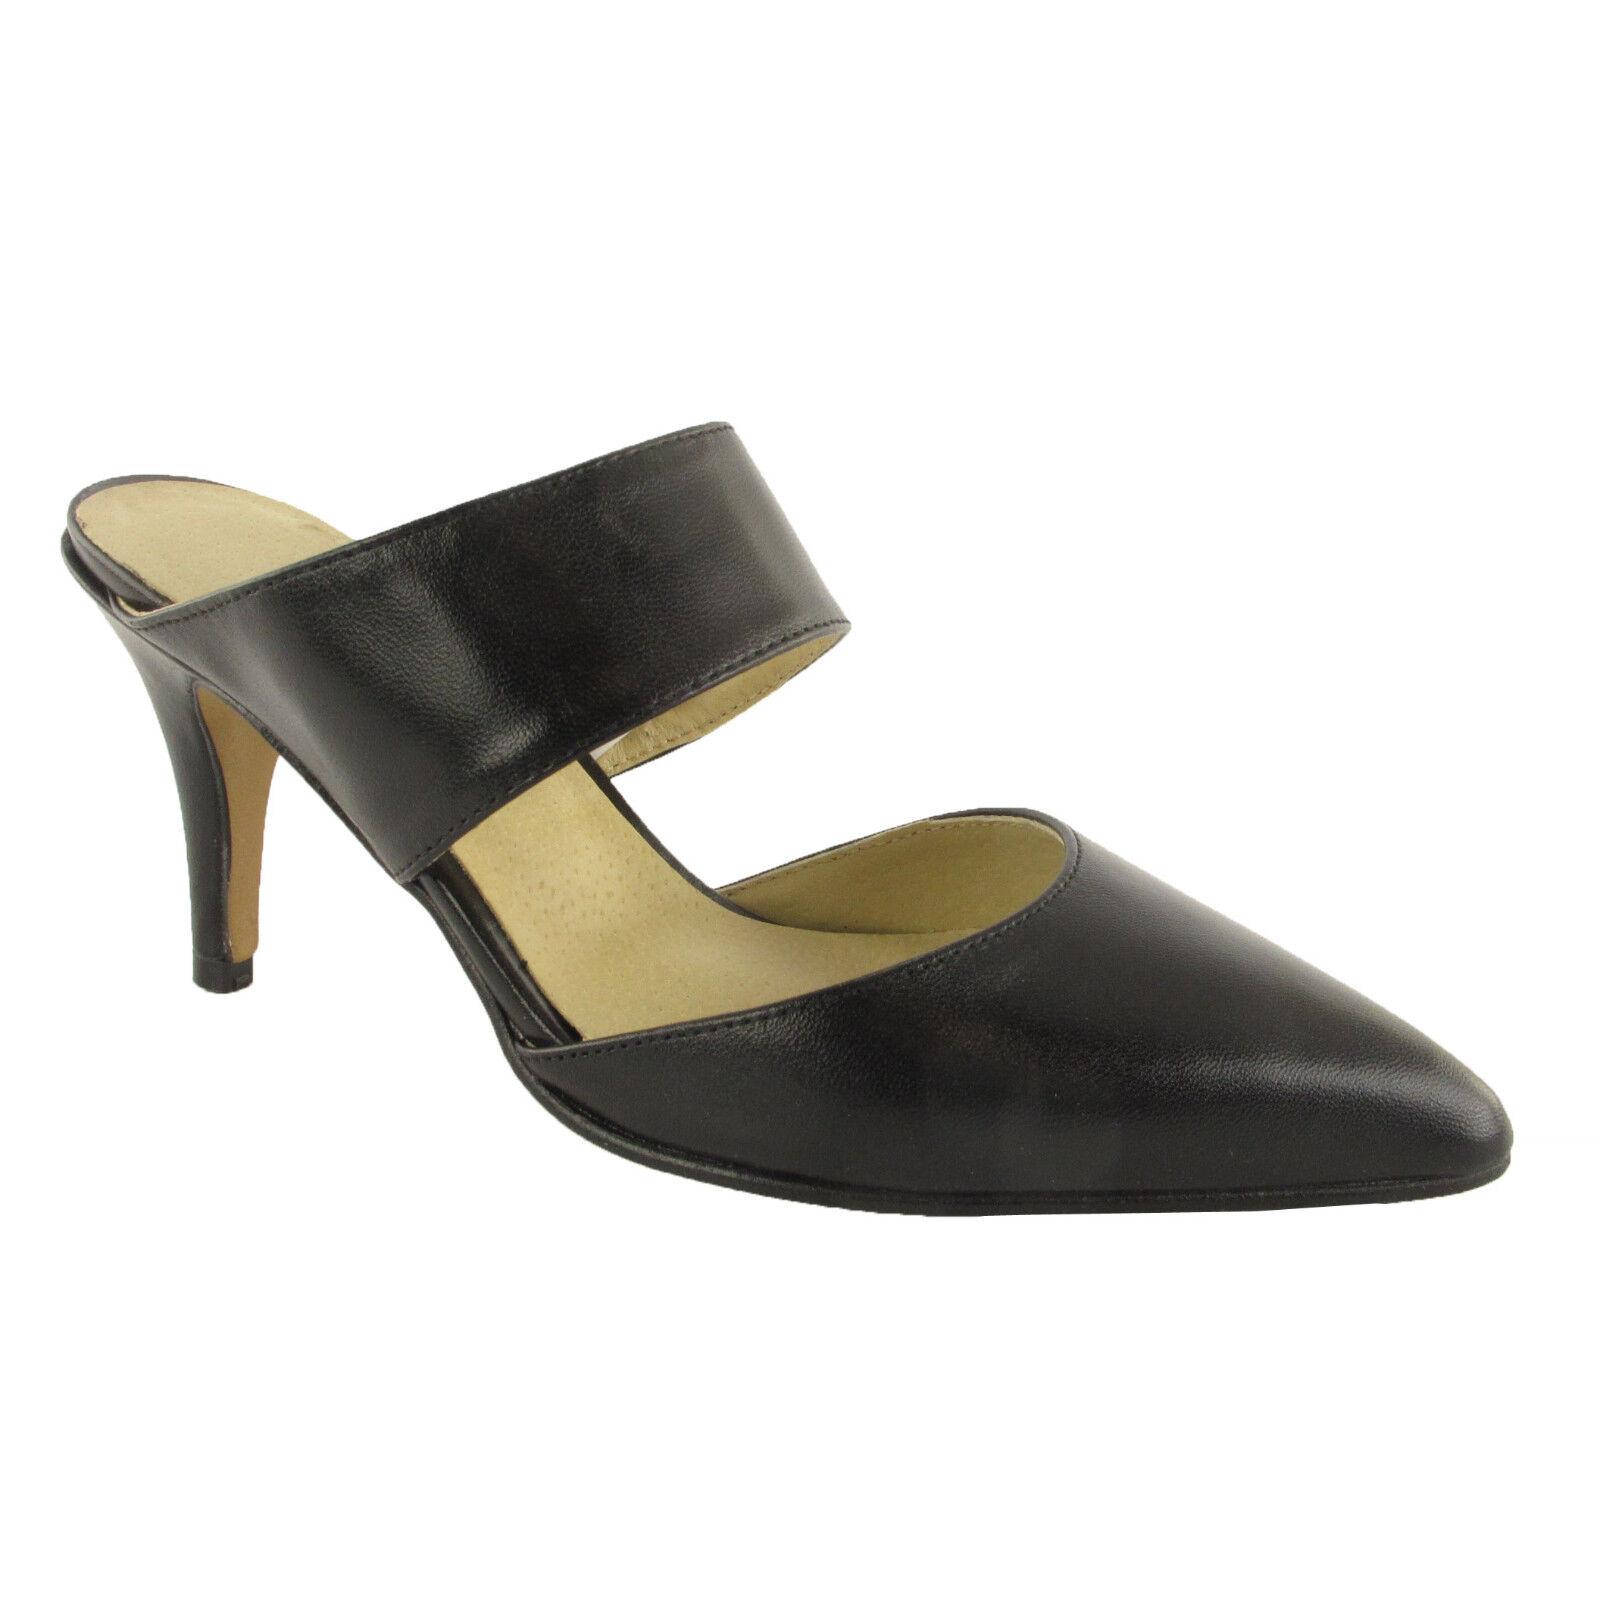 Heine sabot negro nuevo señora zapatos cuero sandalia